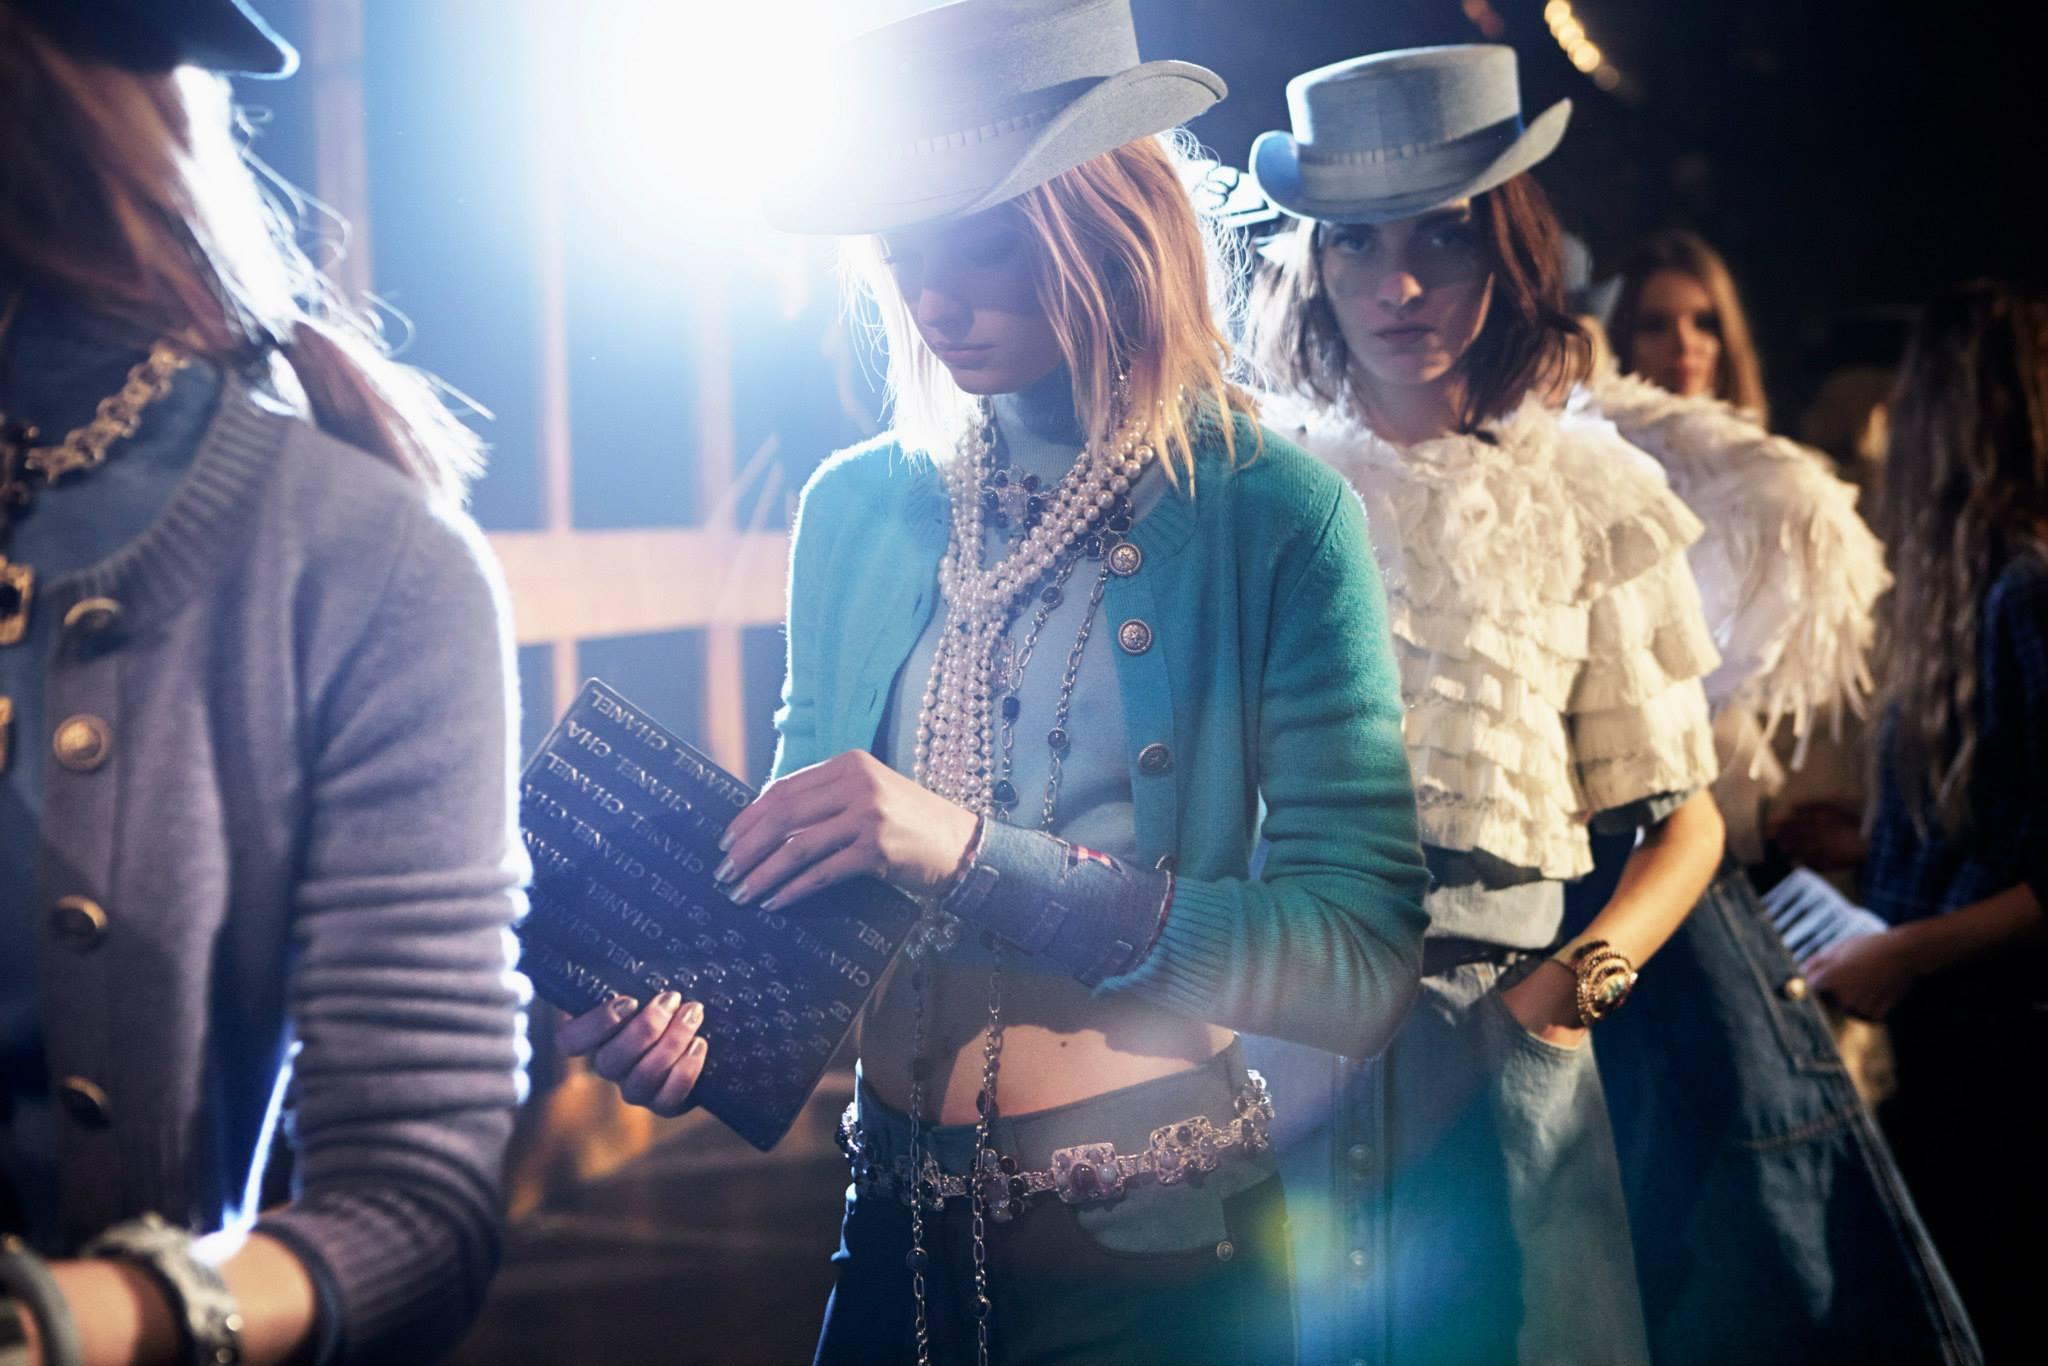 Chanel Paris Dallas Show 2013/14 Lagerfeld, cowboy wild west cancan